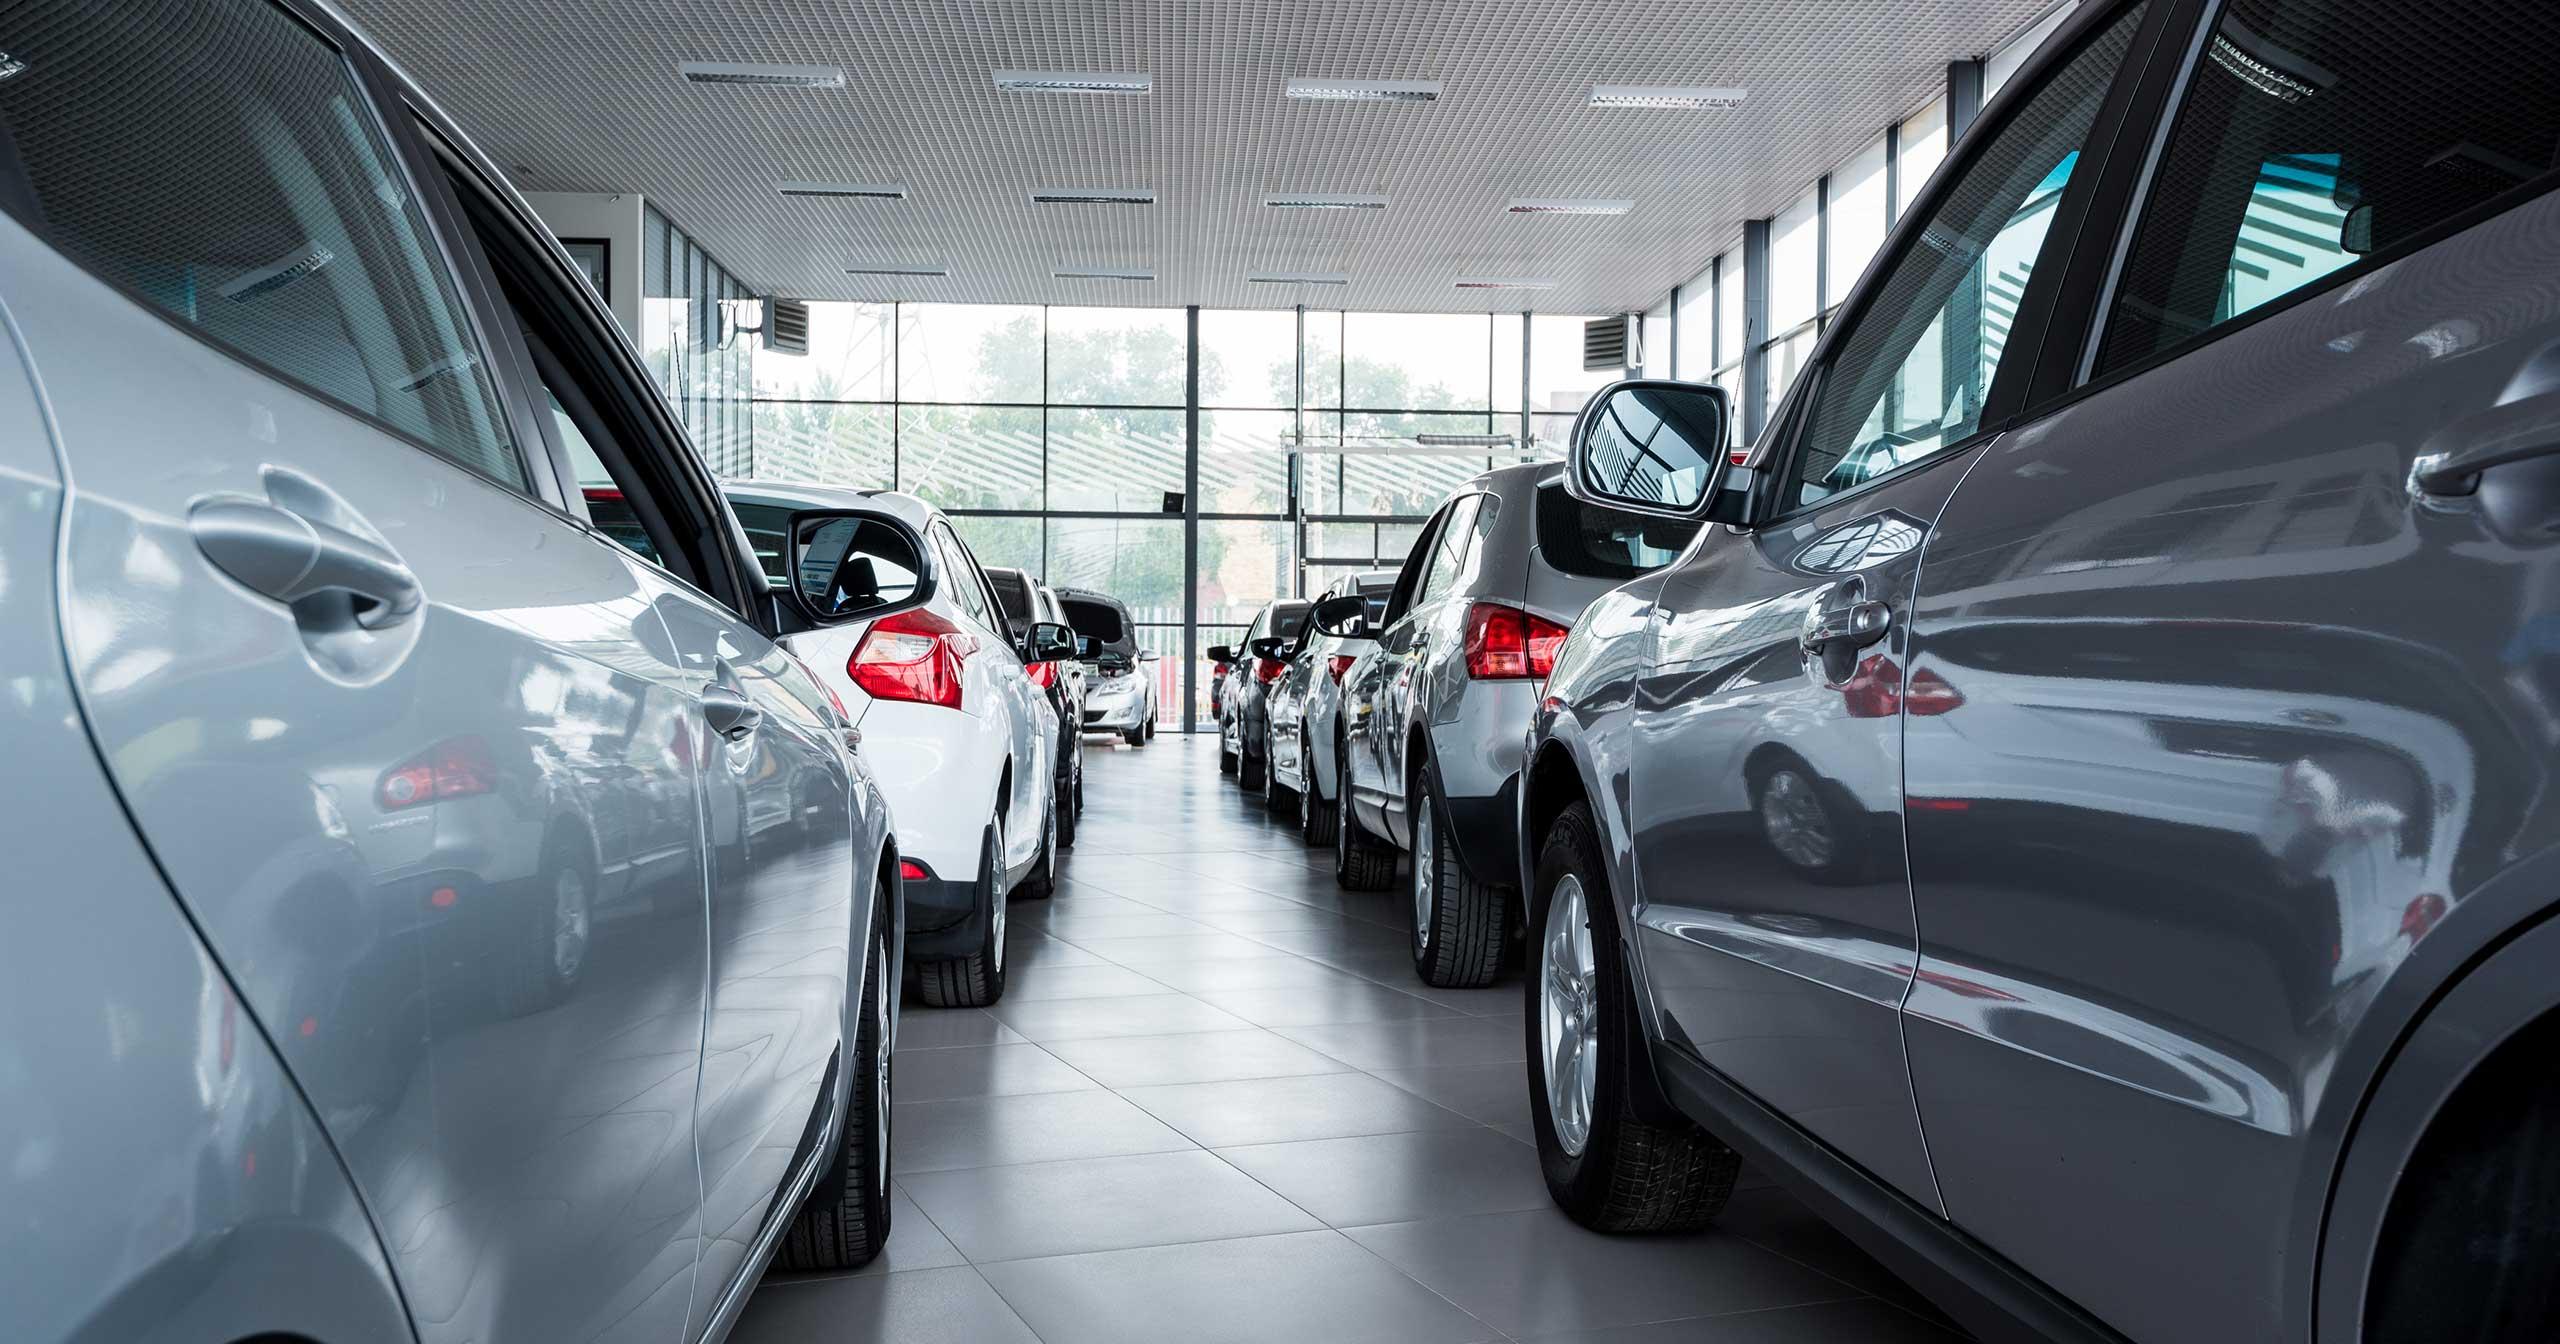 2018 Consumer Survey of Automotive Finance Perceptions Canada